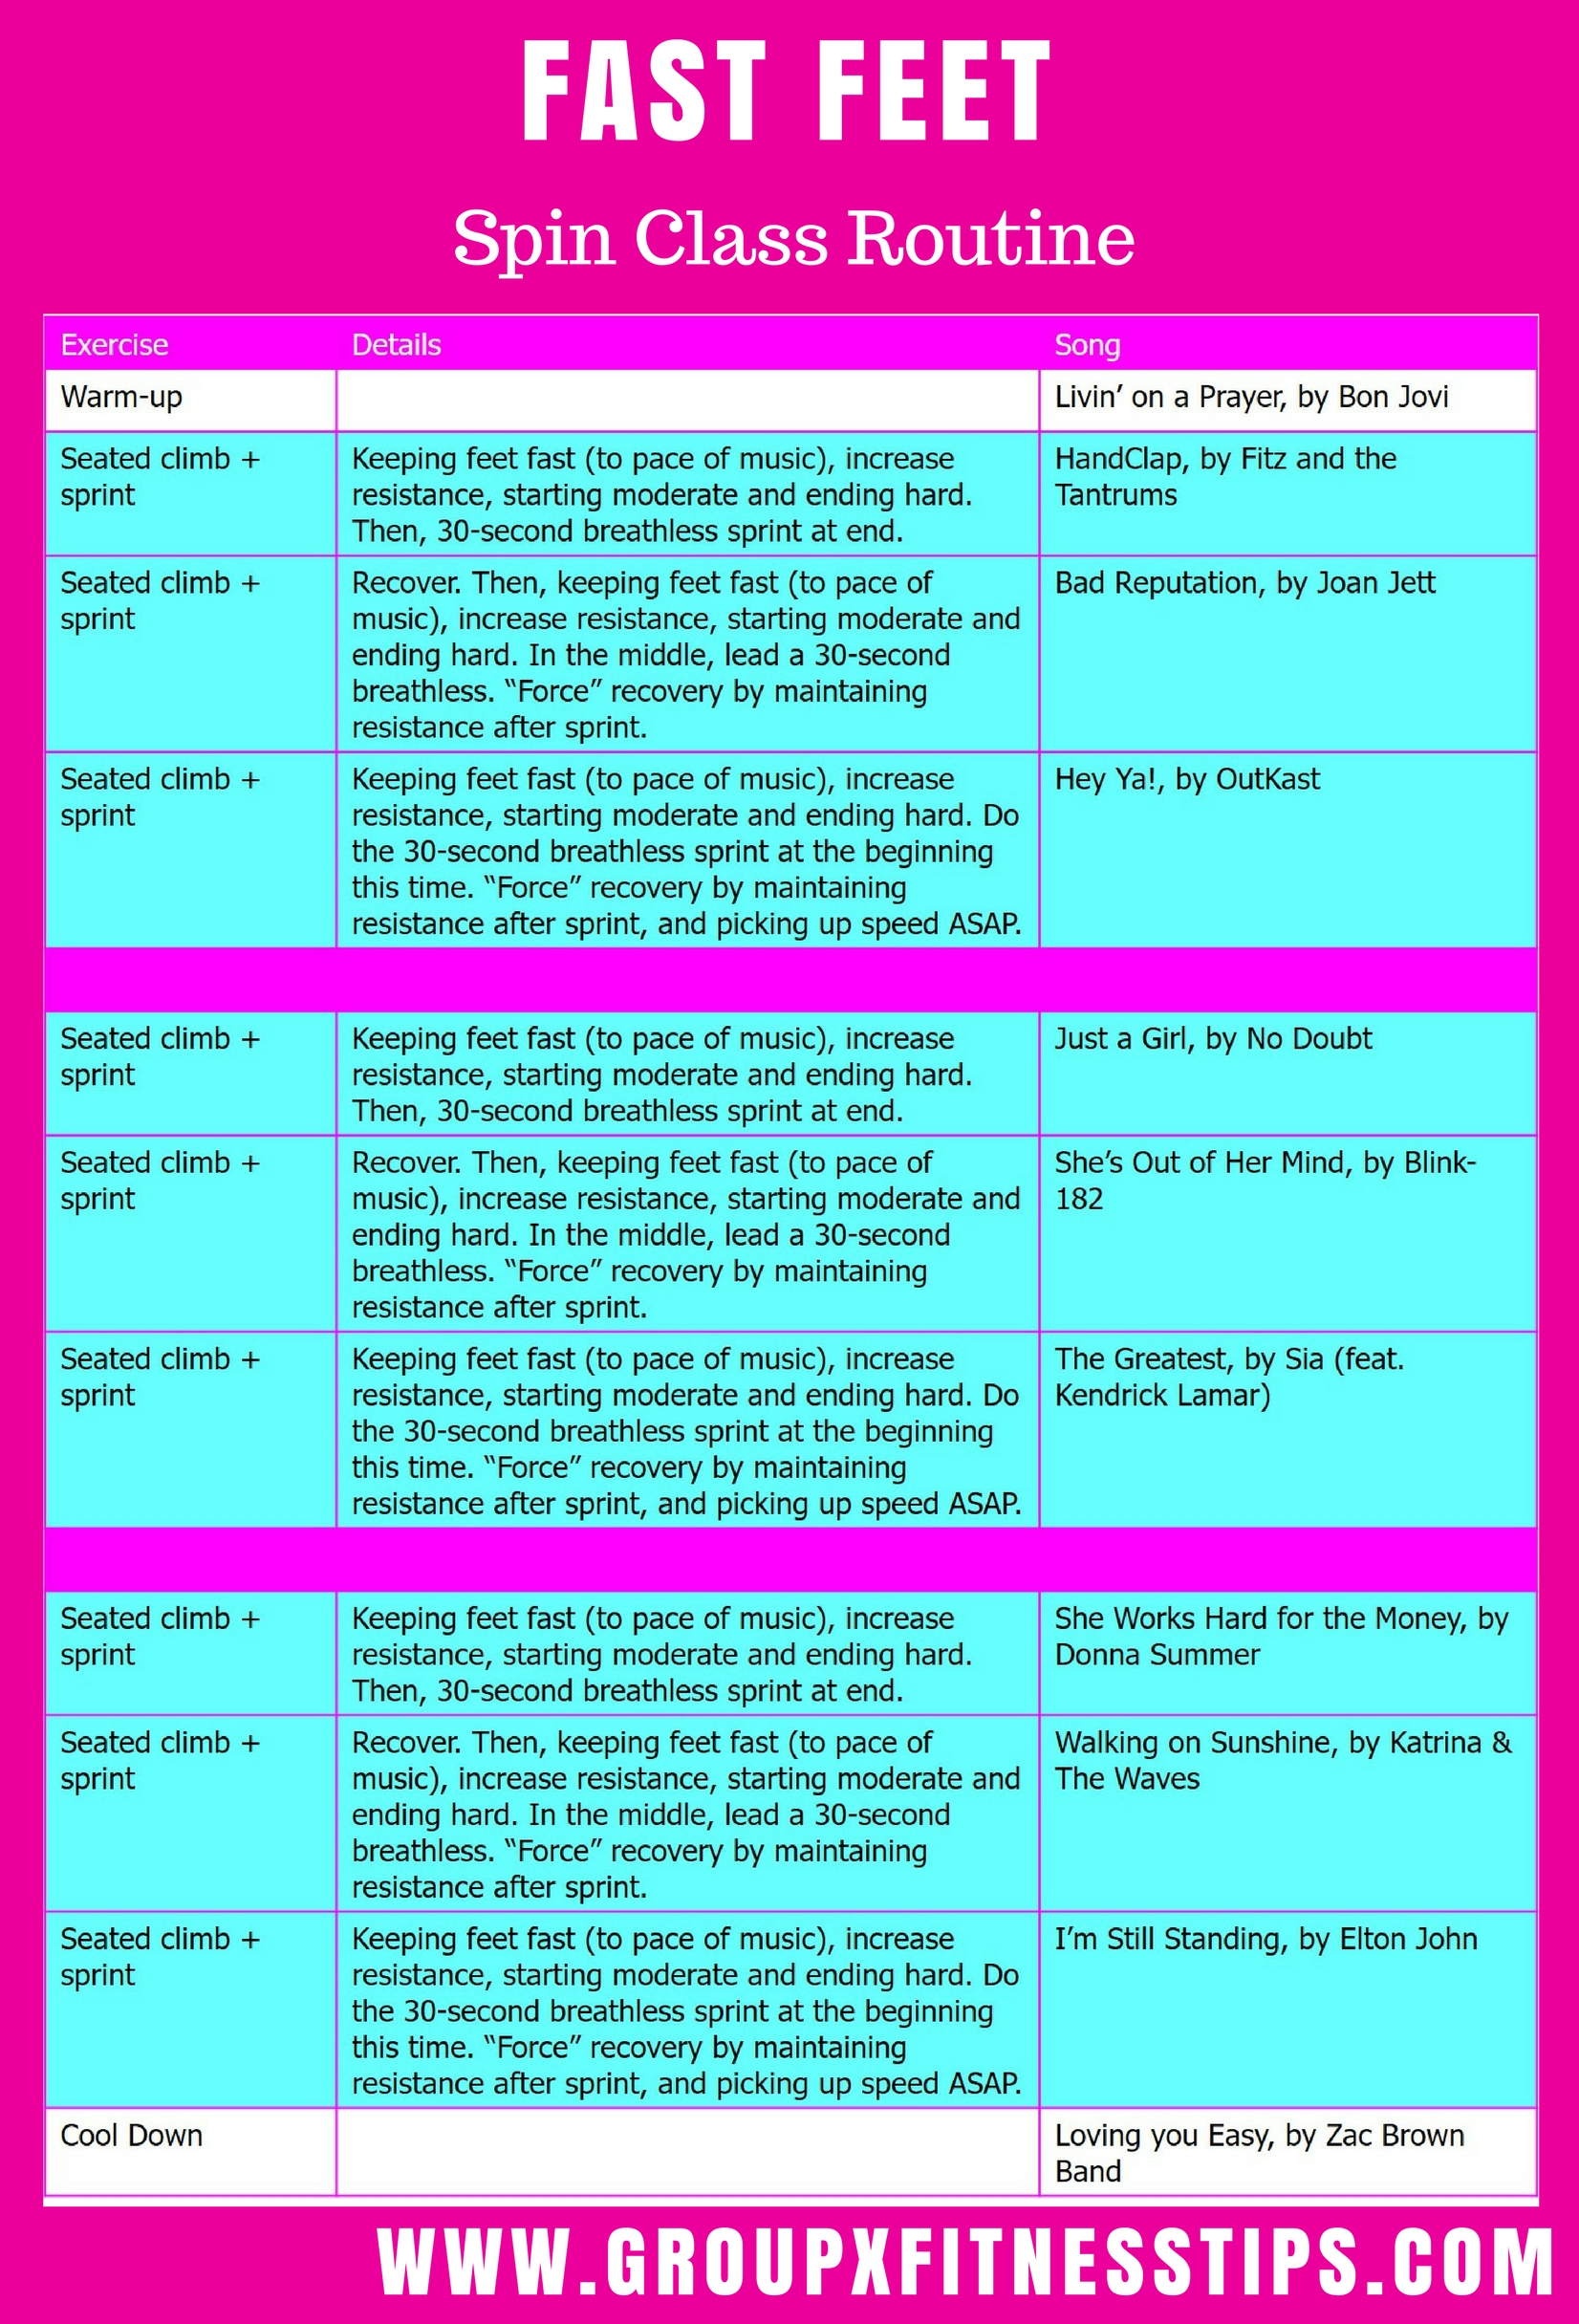 45 minute spin class routine ideas fast feet groupxfitnesstips com